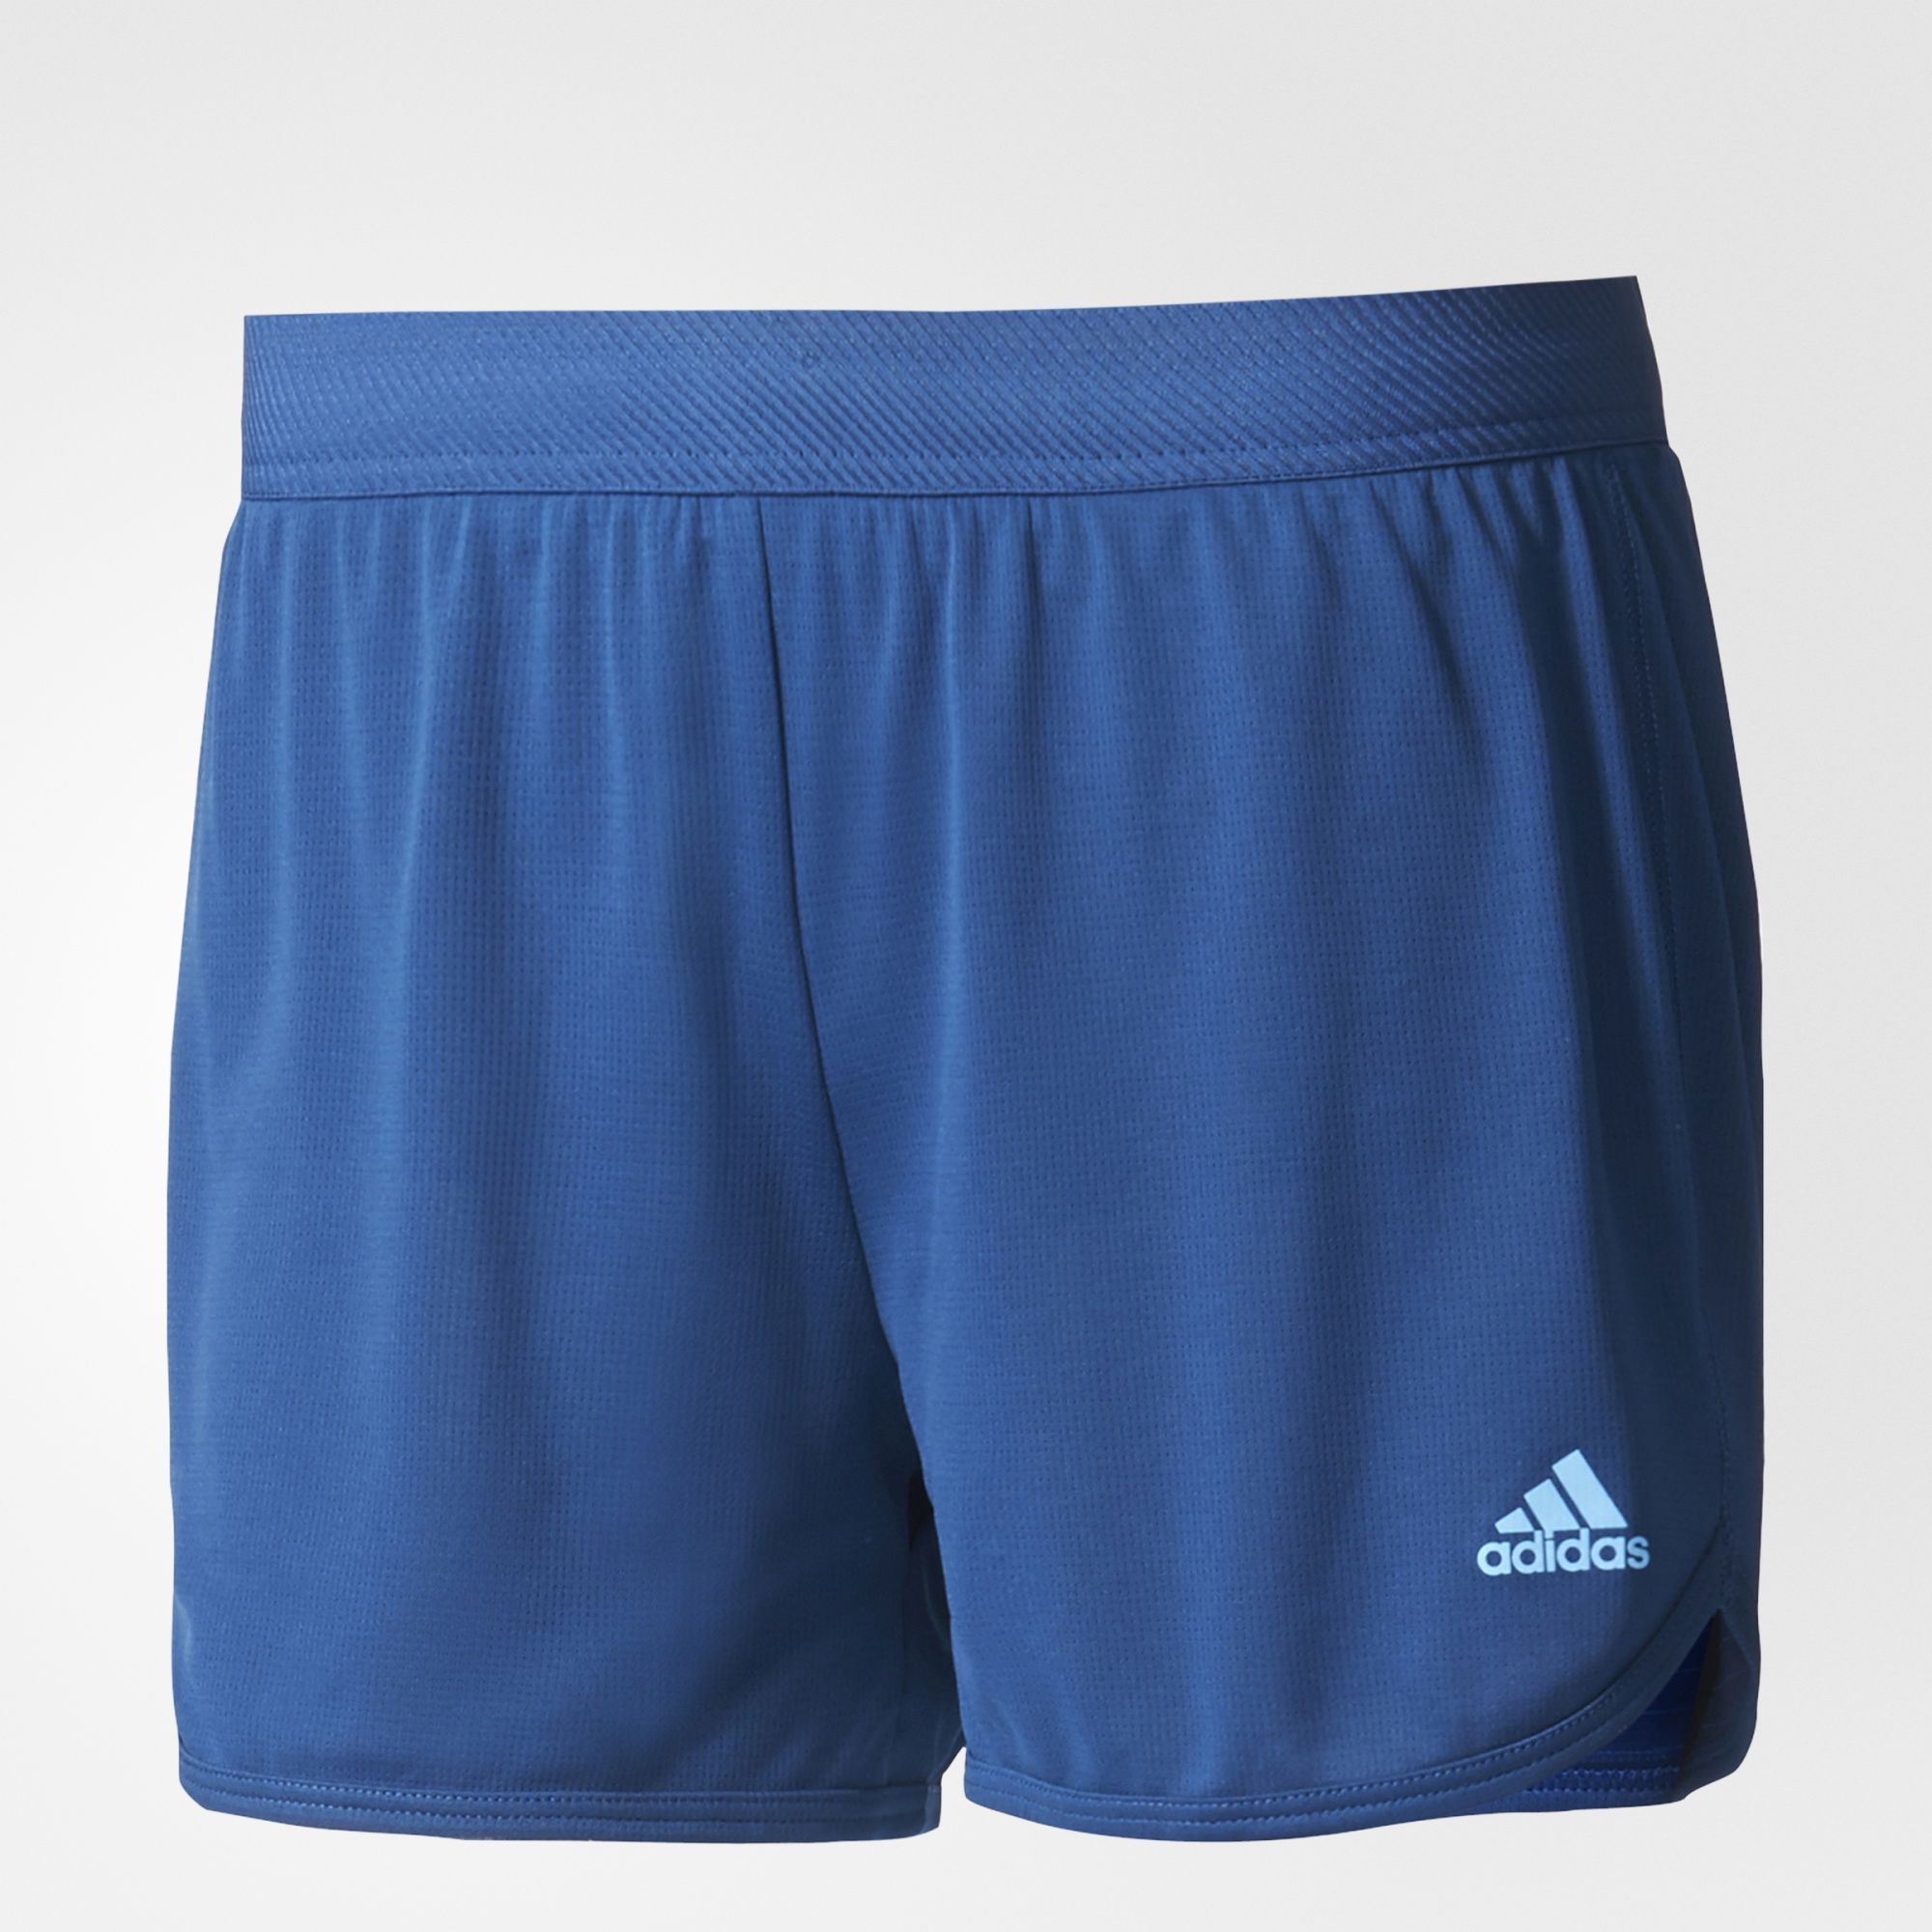 dividir Se convierte en Psicologicamente  adidas - Pantalón corto Climachill | Pantalones adidas, Pantalones cortos, Pantalon  corto mujer